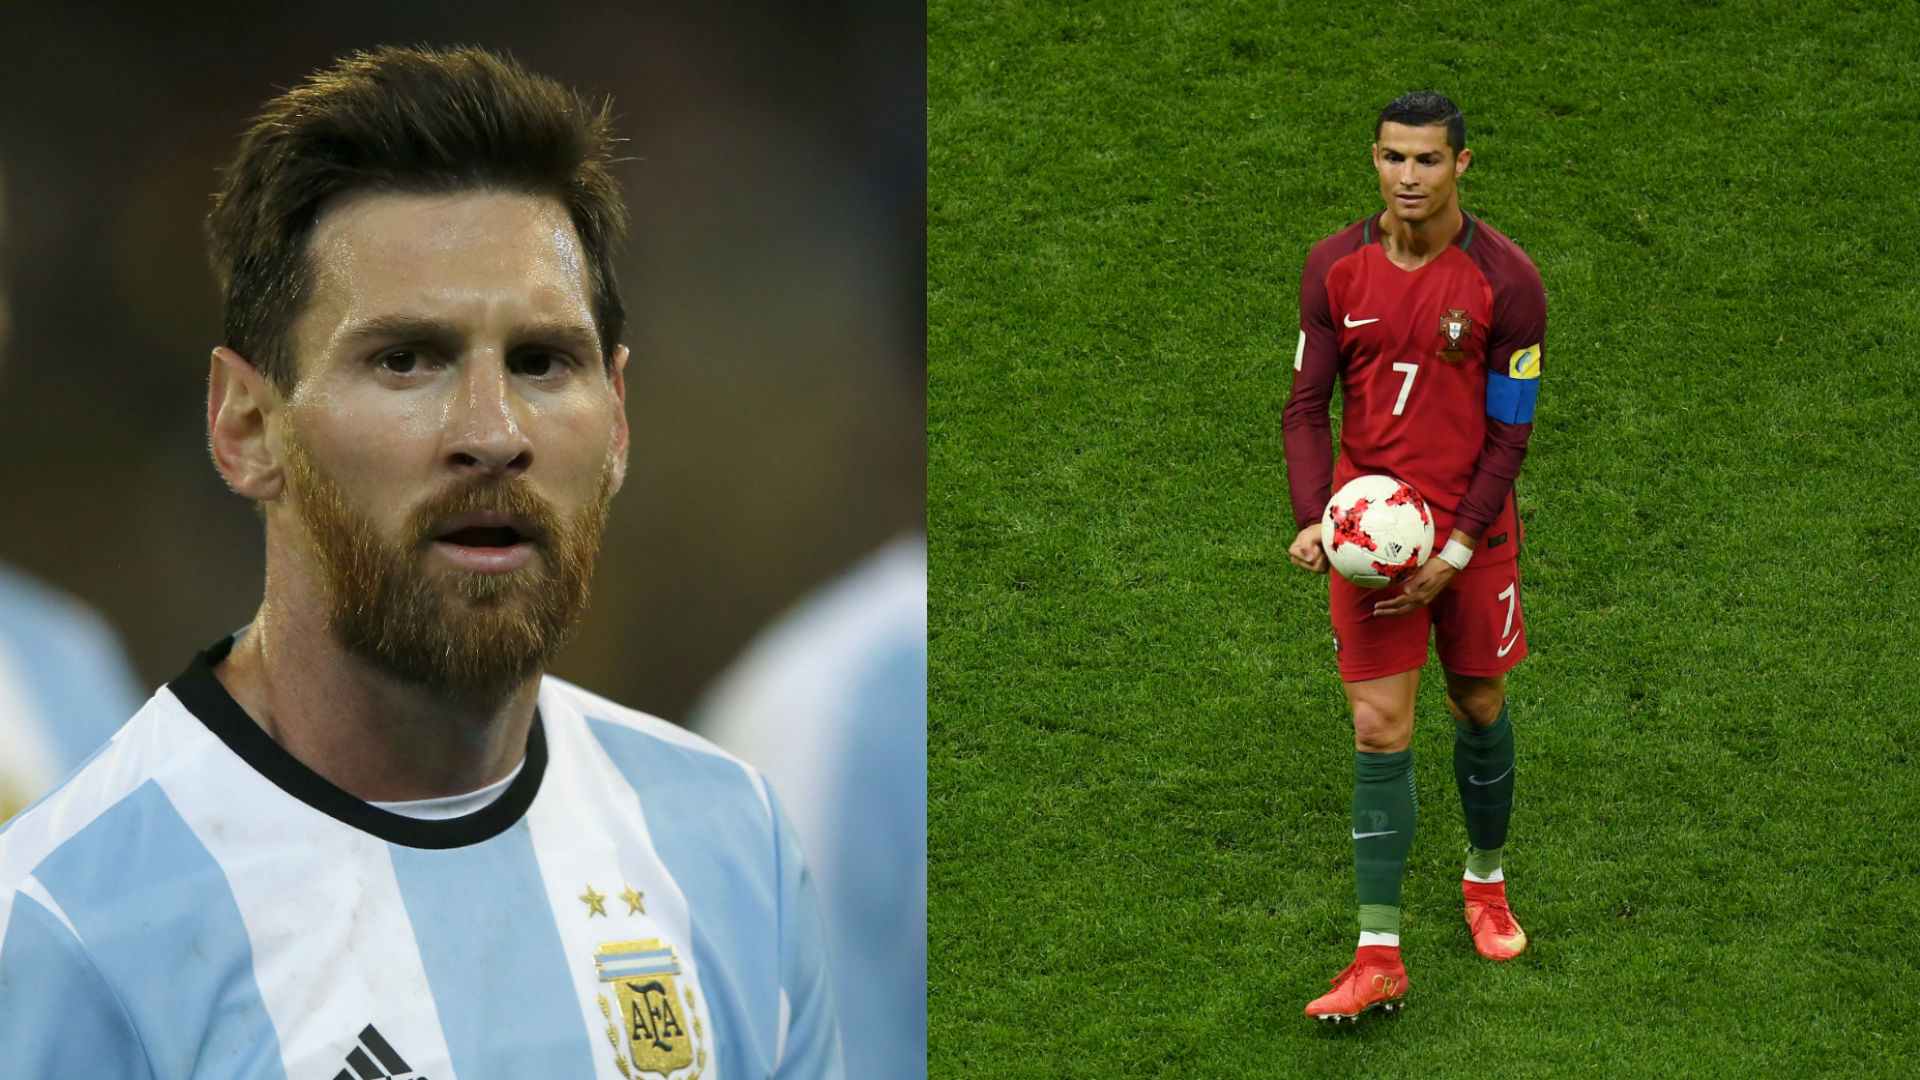 Cristiano Ronaldo cuenta su inspiradora historia como futbolista